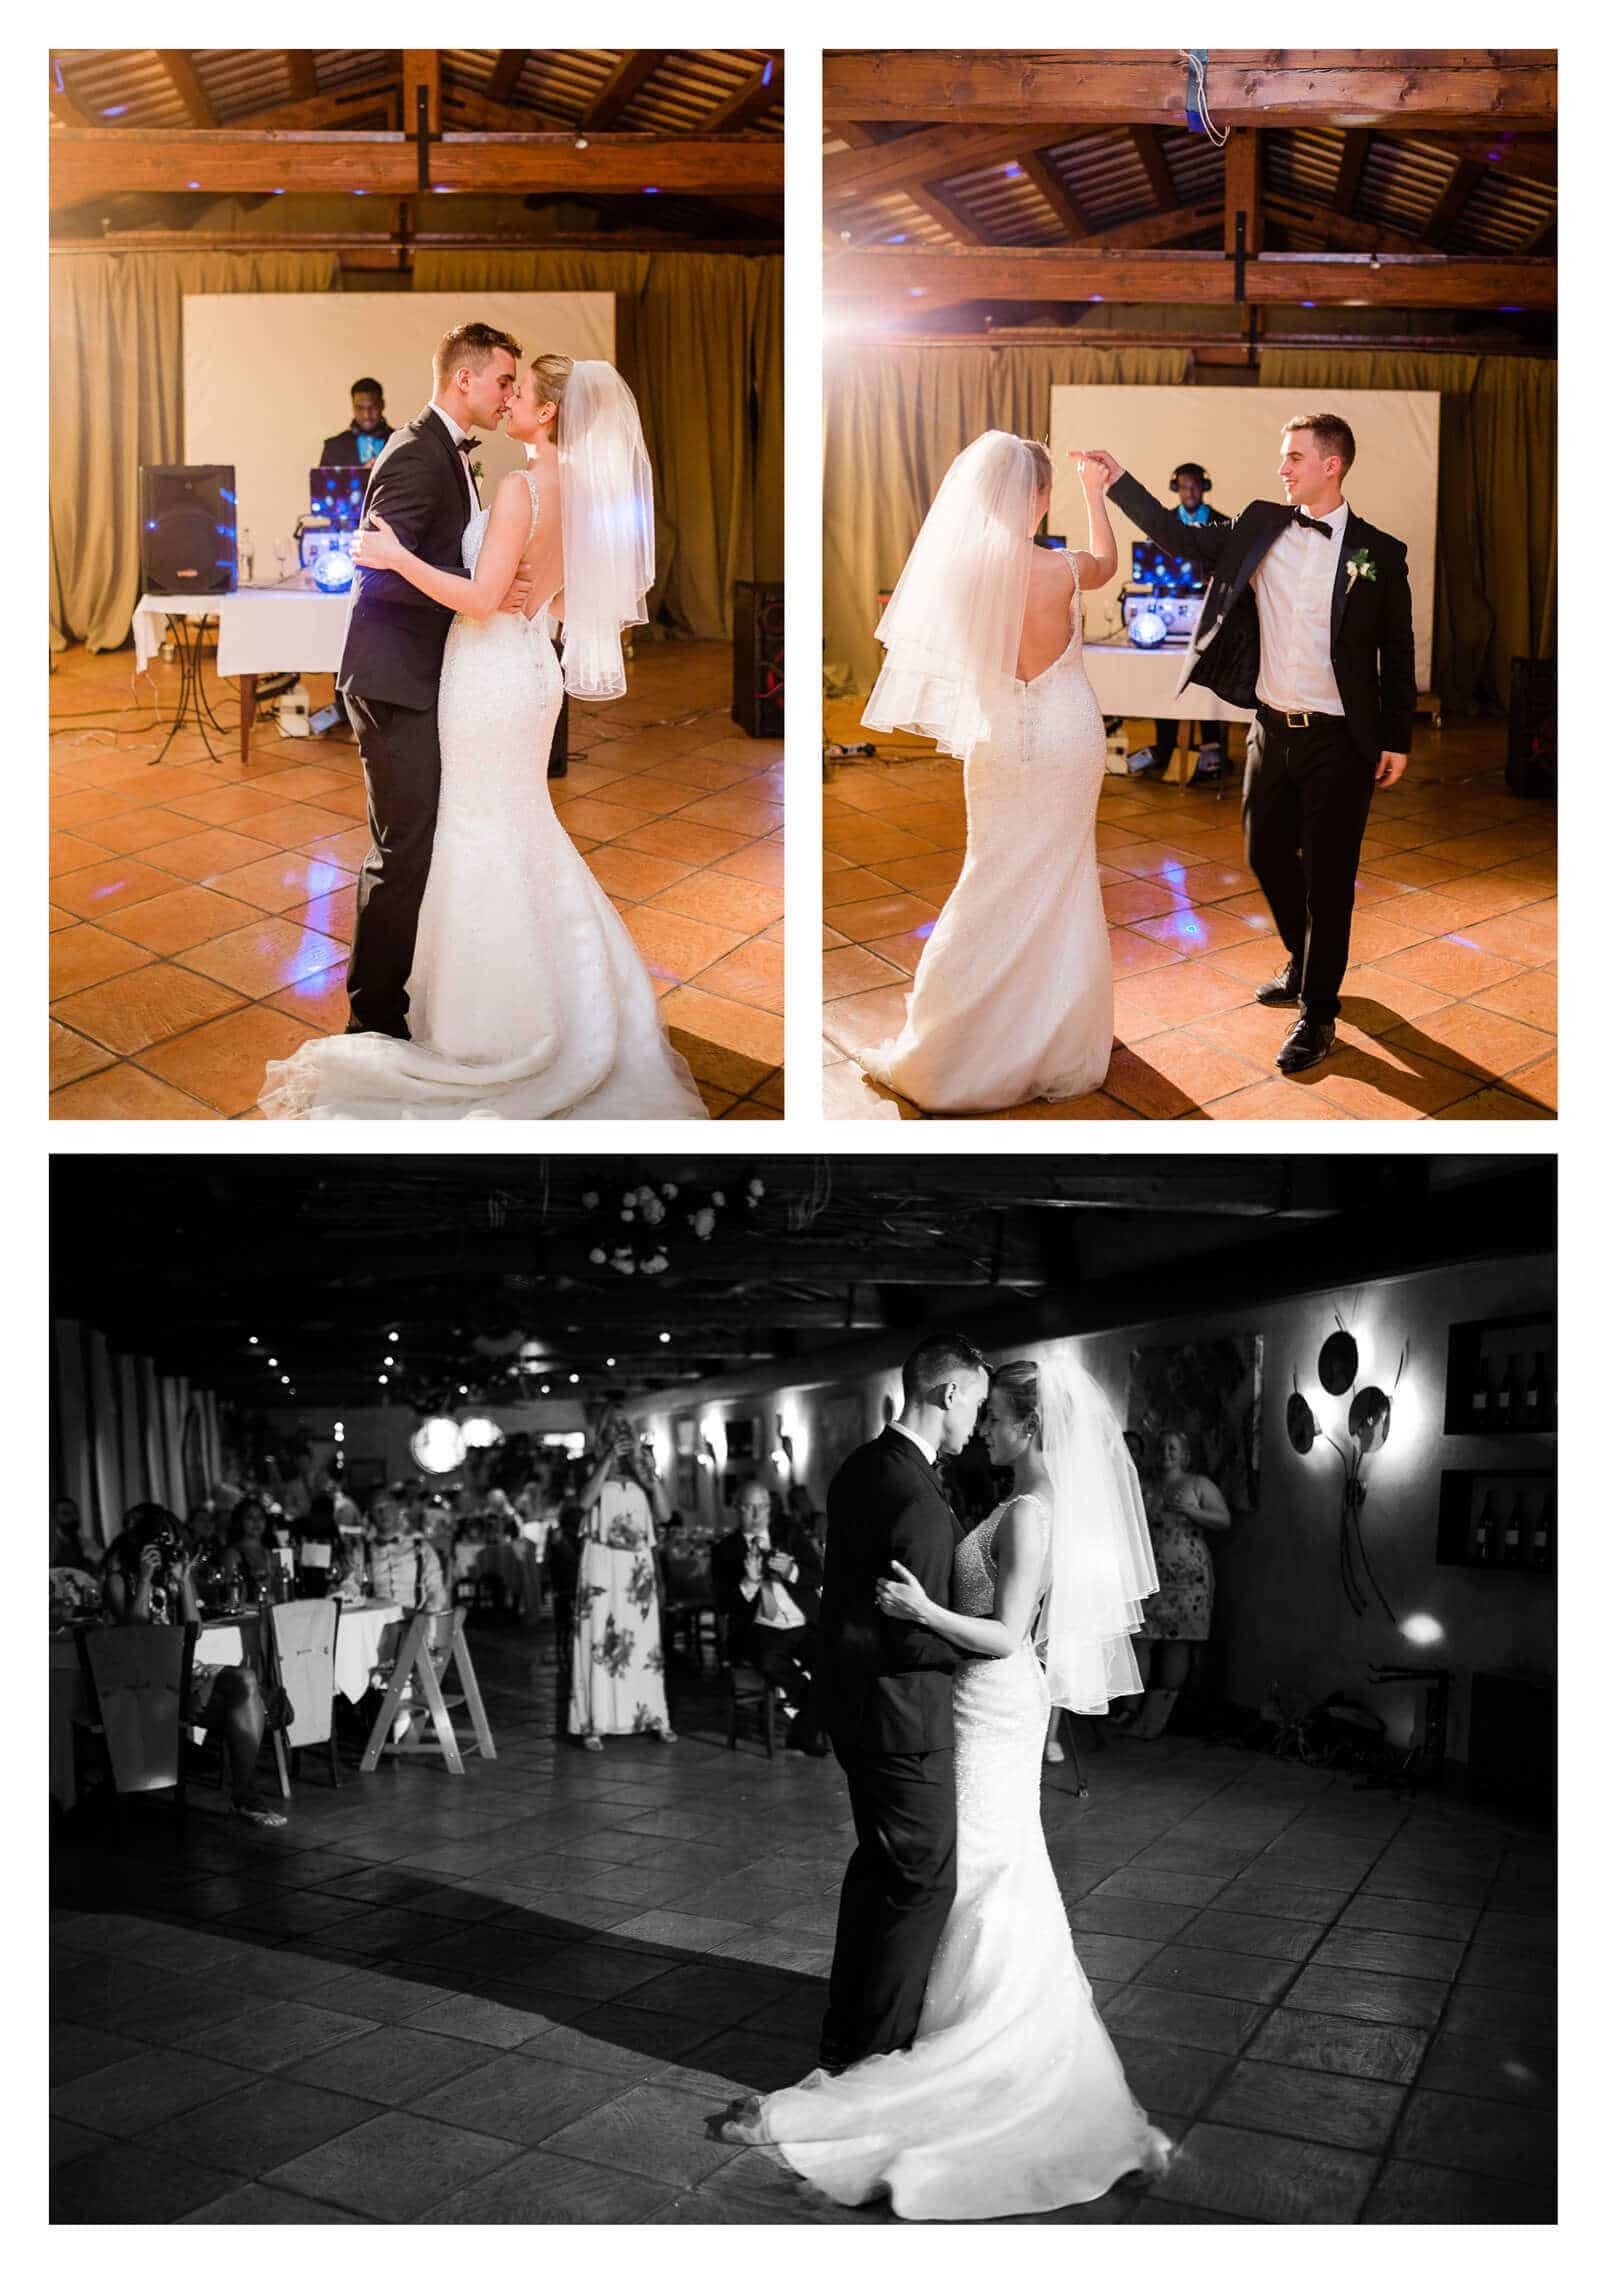 First dance Fossa Mala vineyard wedding venue | Pordenone Destination photographer